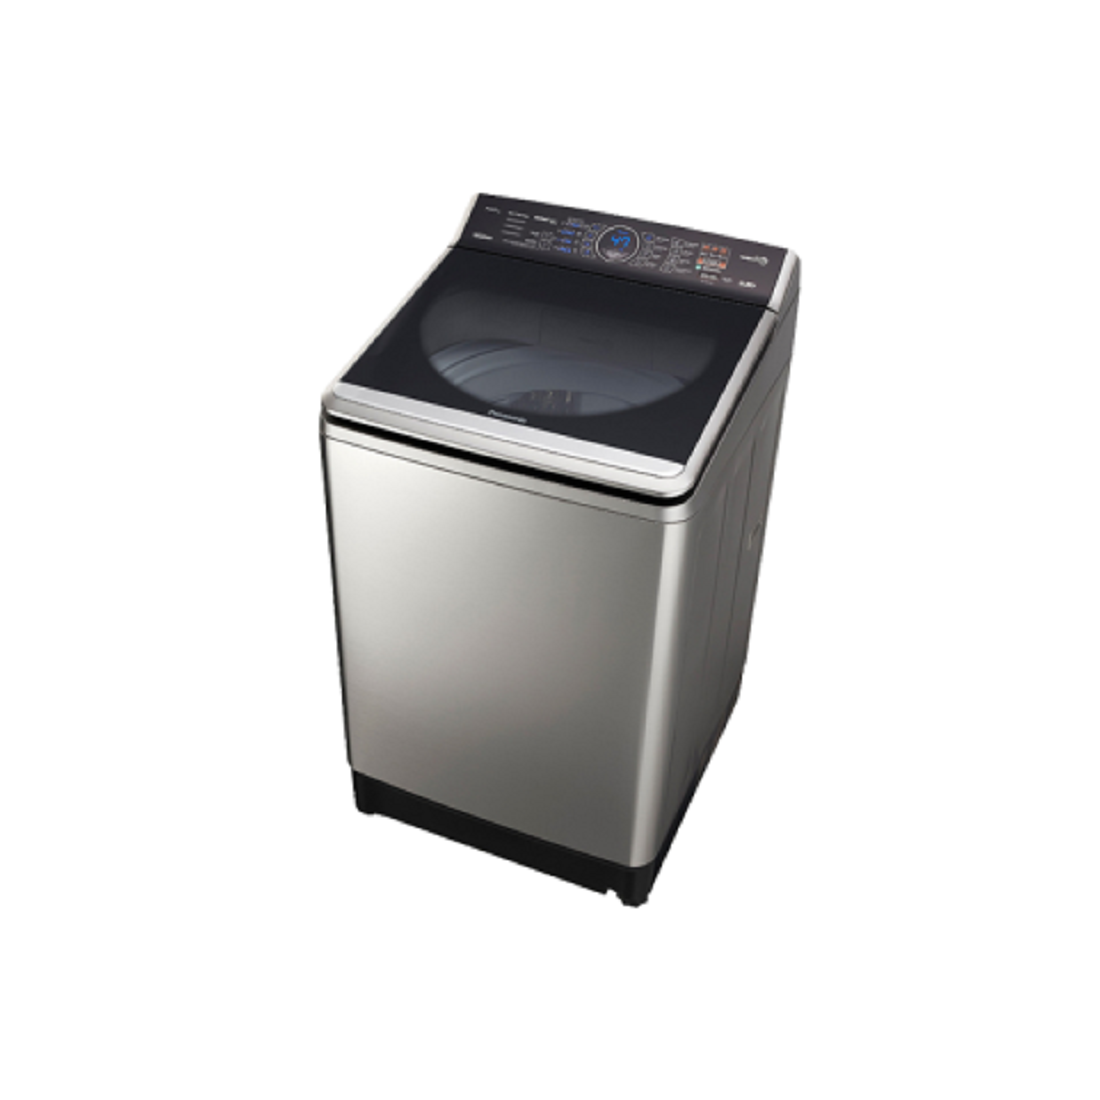 Máy giặt Panasonic Inverter 14 kg NA-FS14V5SRV-Thế giới đồ gia